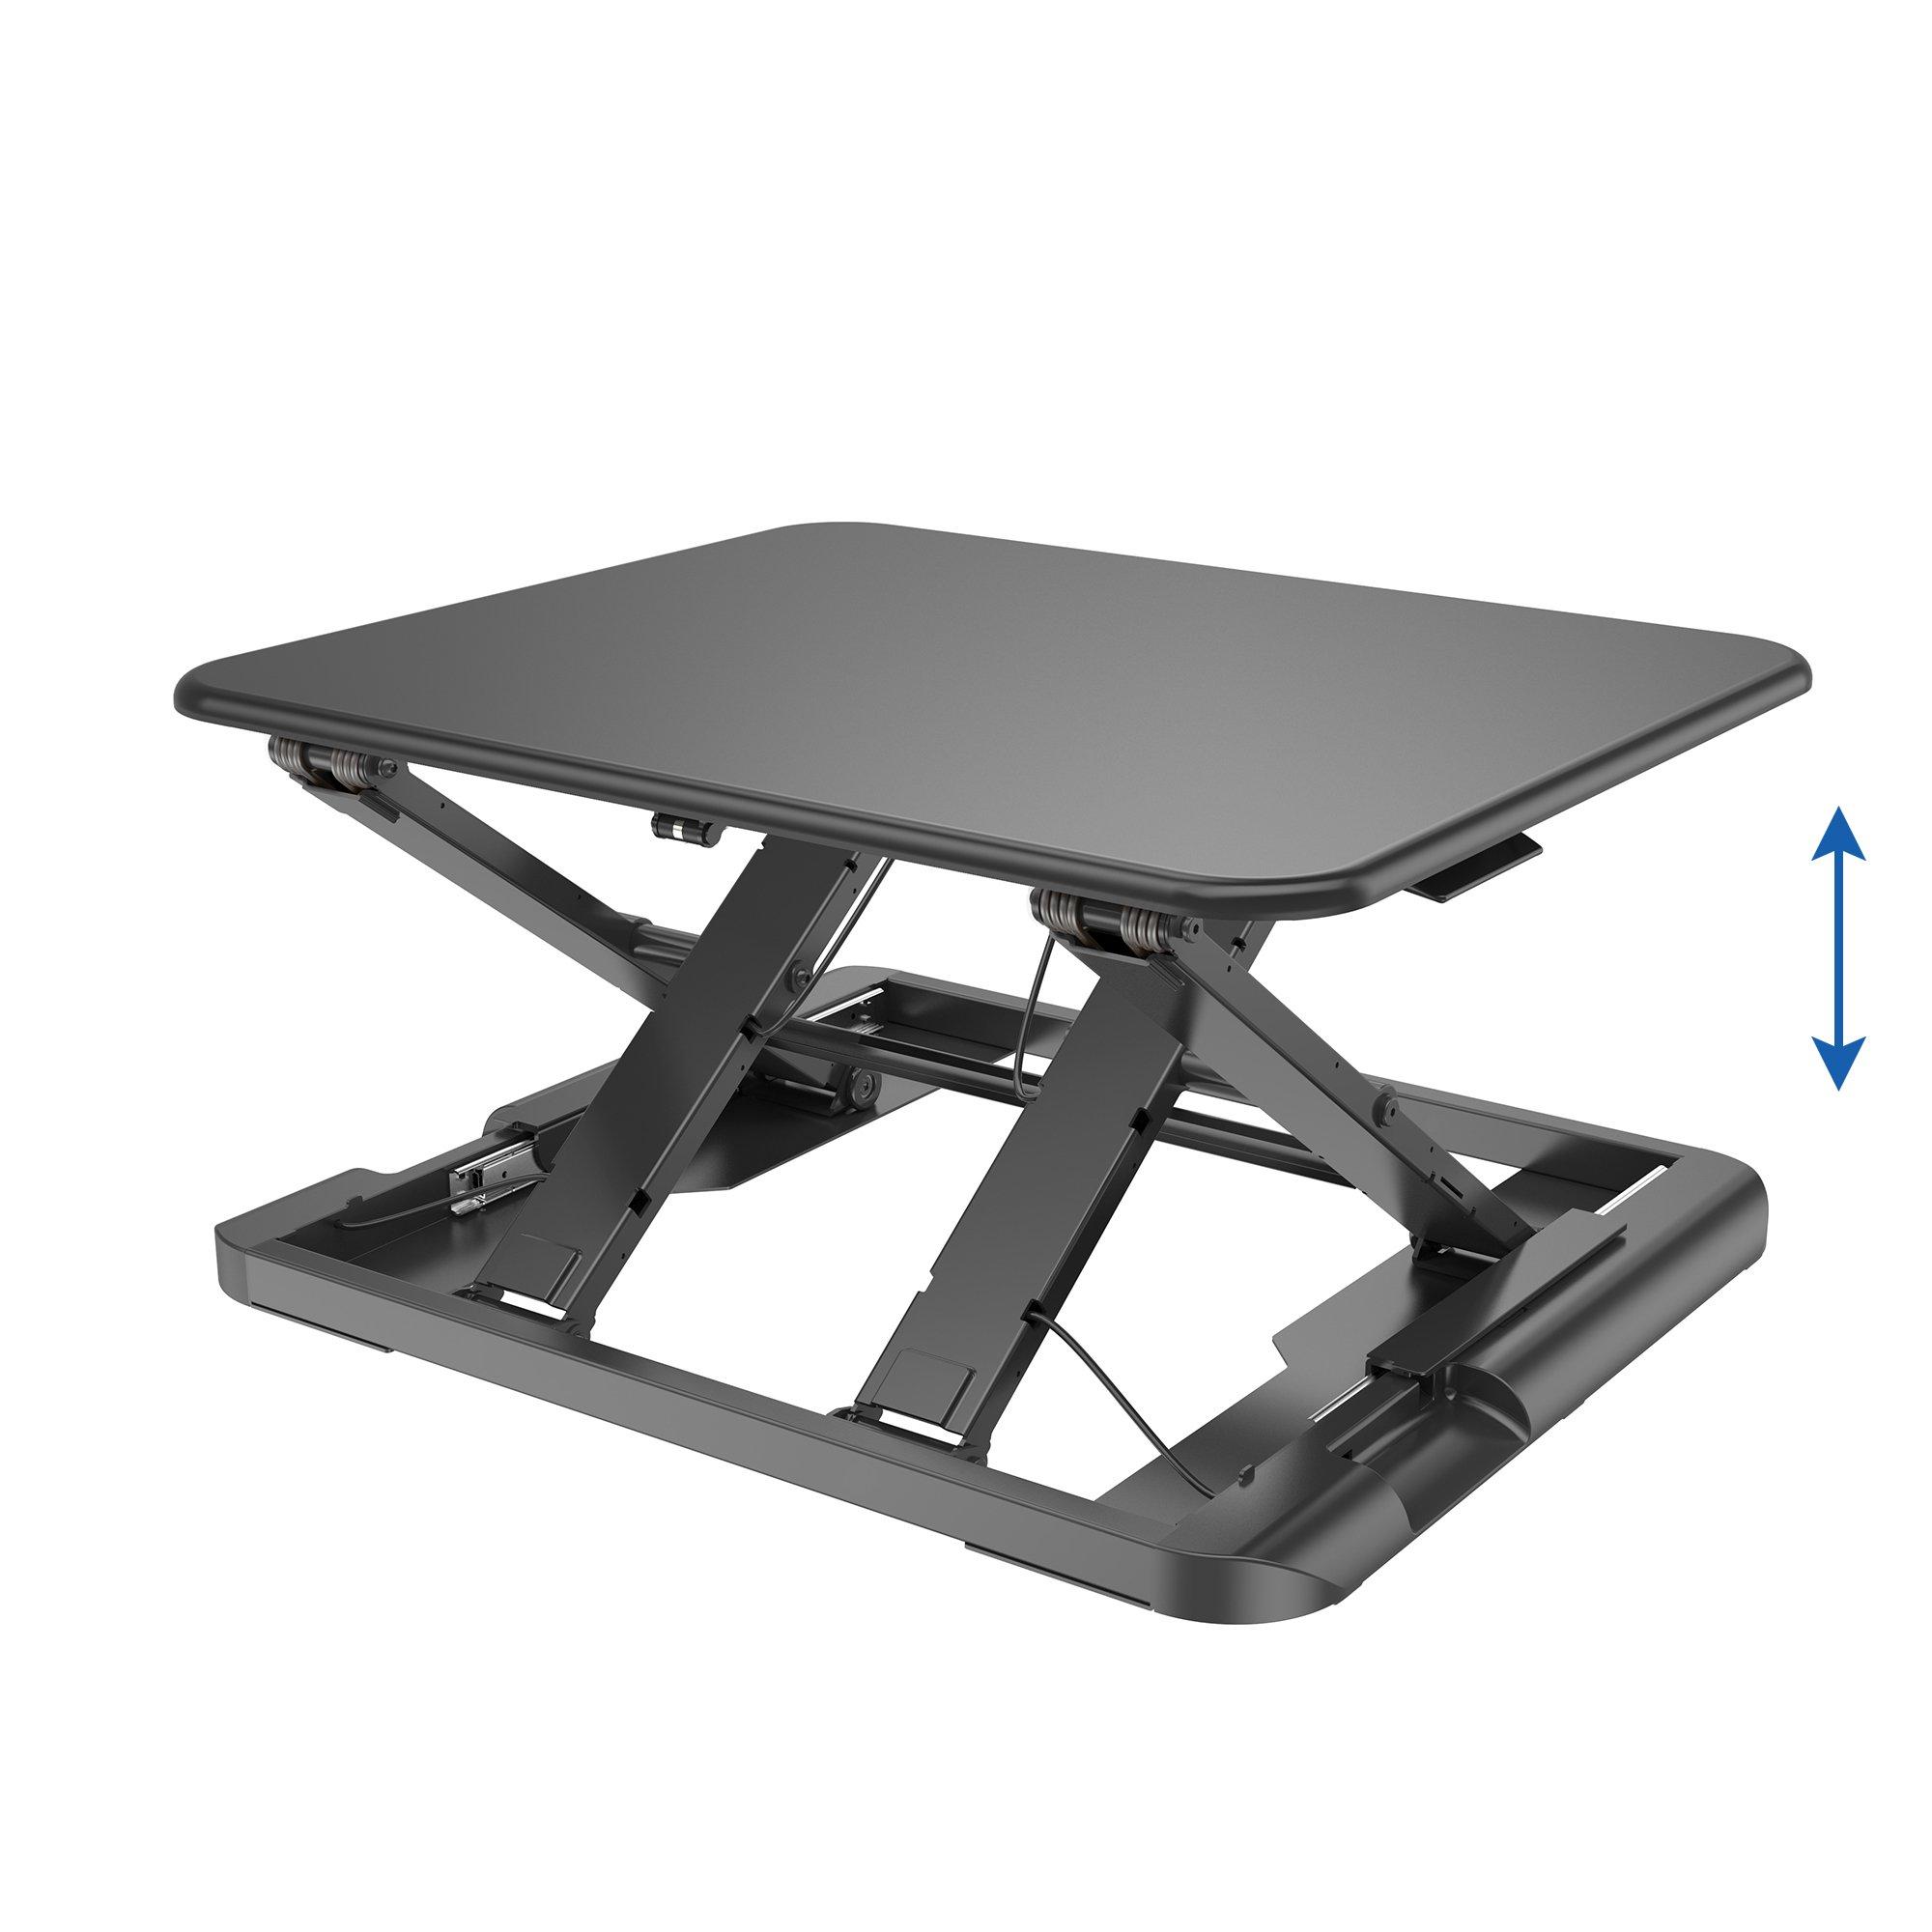 TOTALPACK Standing Desk -X-Elite PRO Sit Stand Desk Converter - Anti Fatigue Height Adjustable Workstation, Extra Large 26.5'' x 22.2'' Desktop Surface, Easy To Raise & Lower - Pre-Assembled, Black